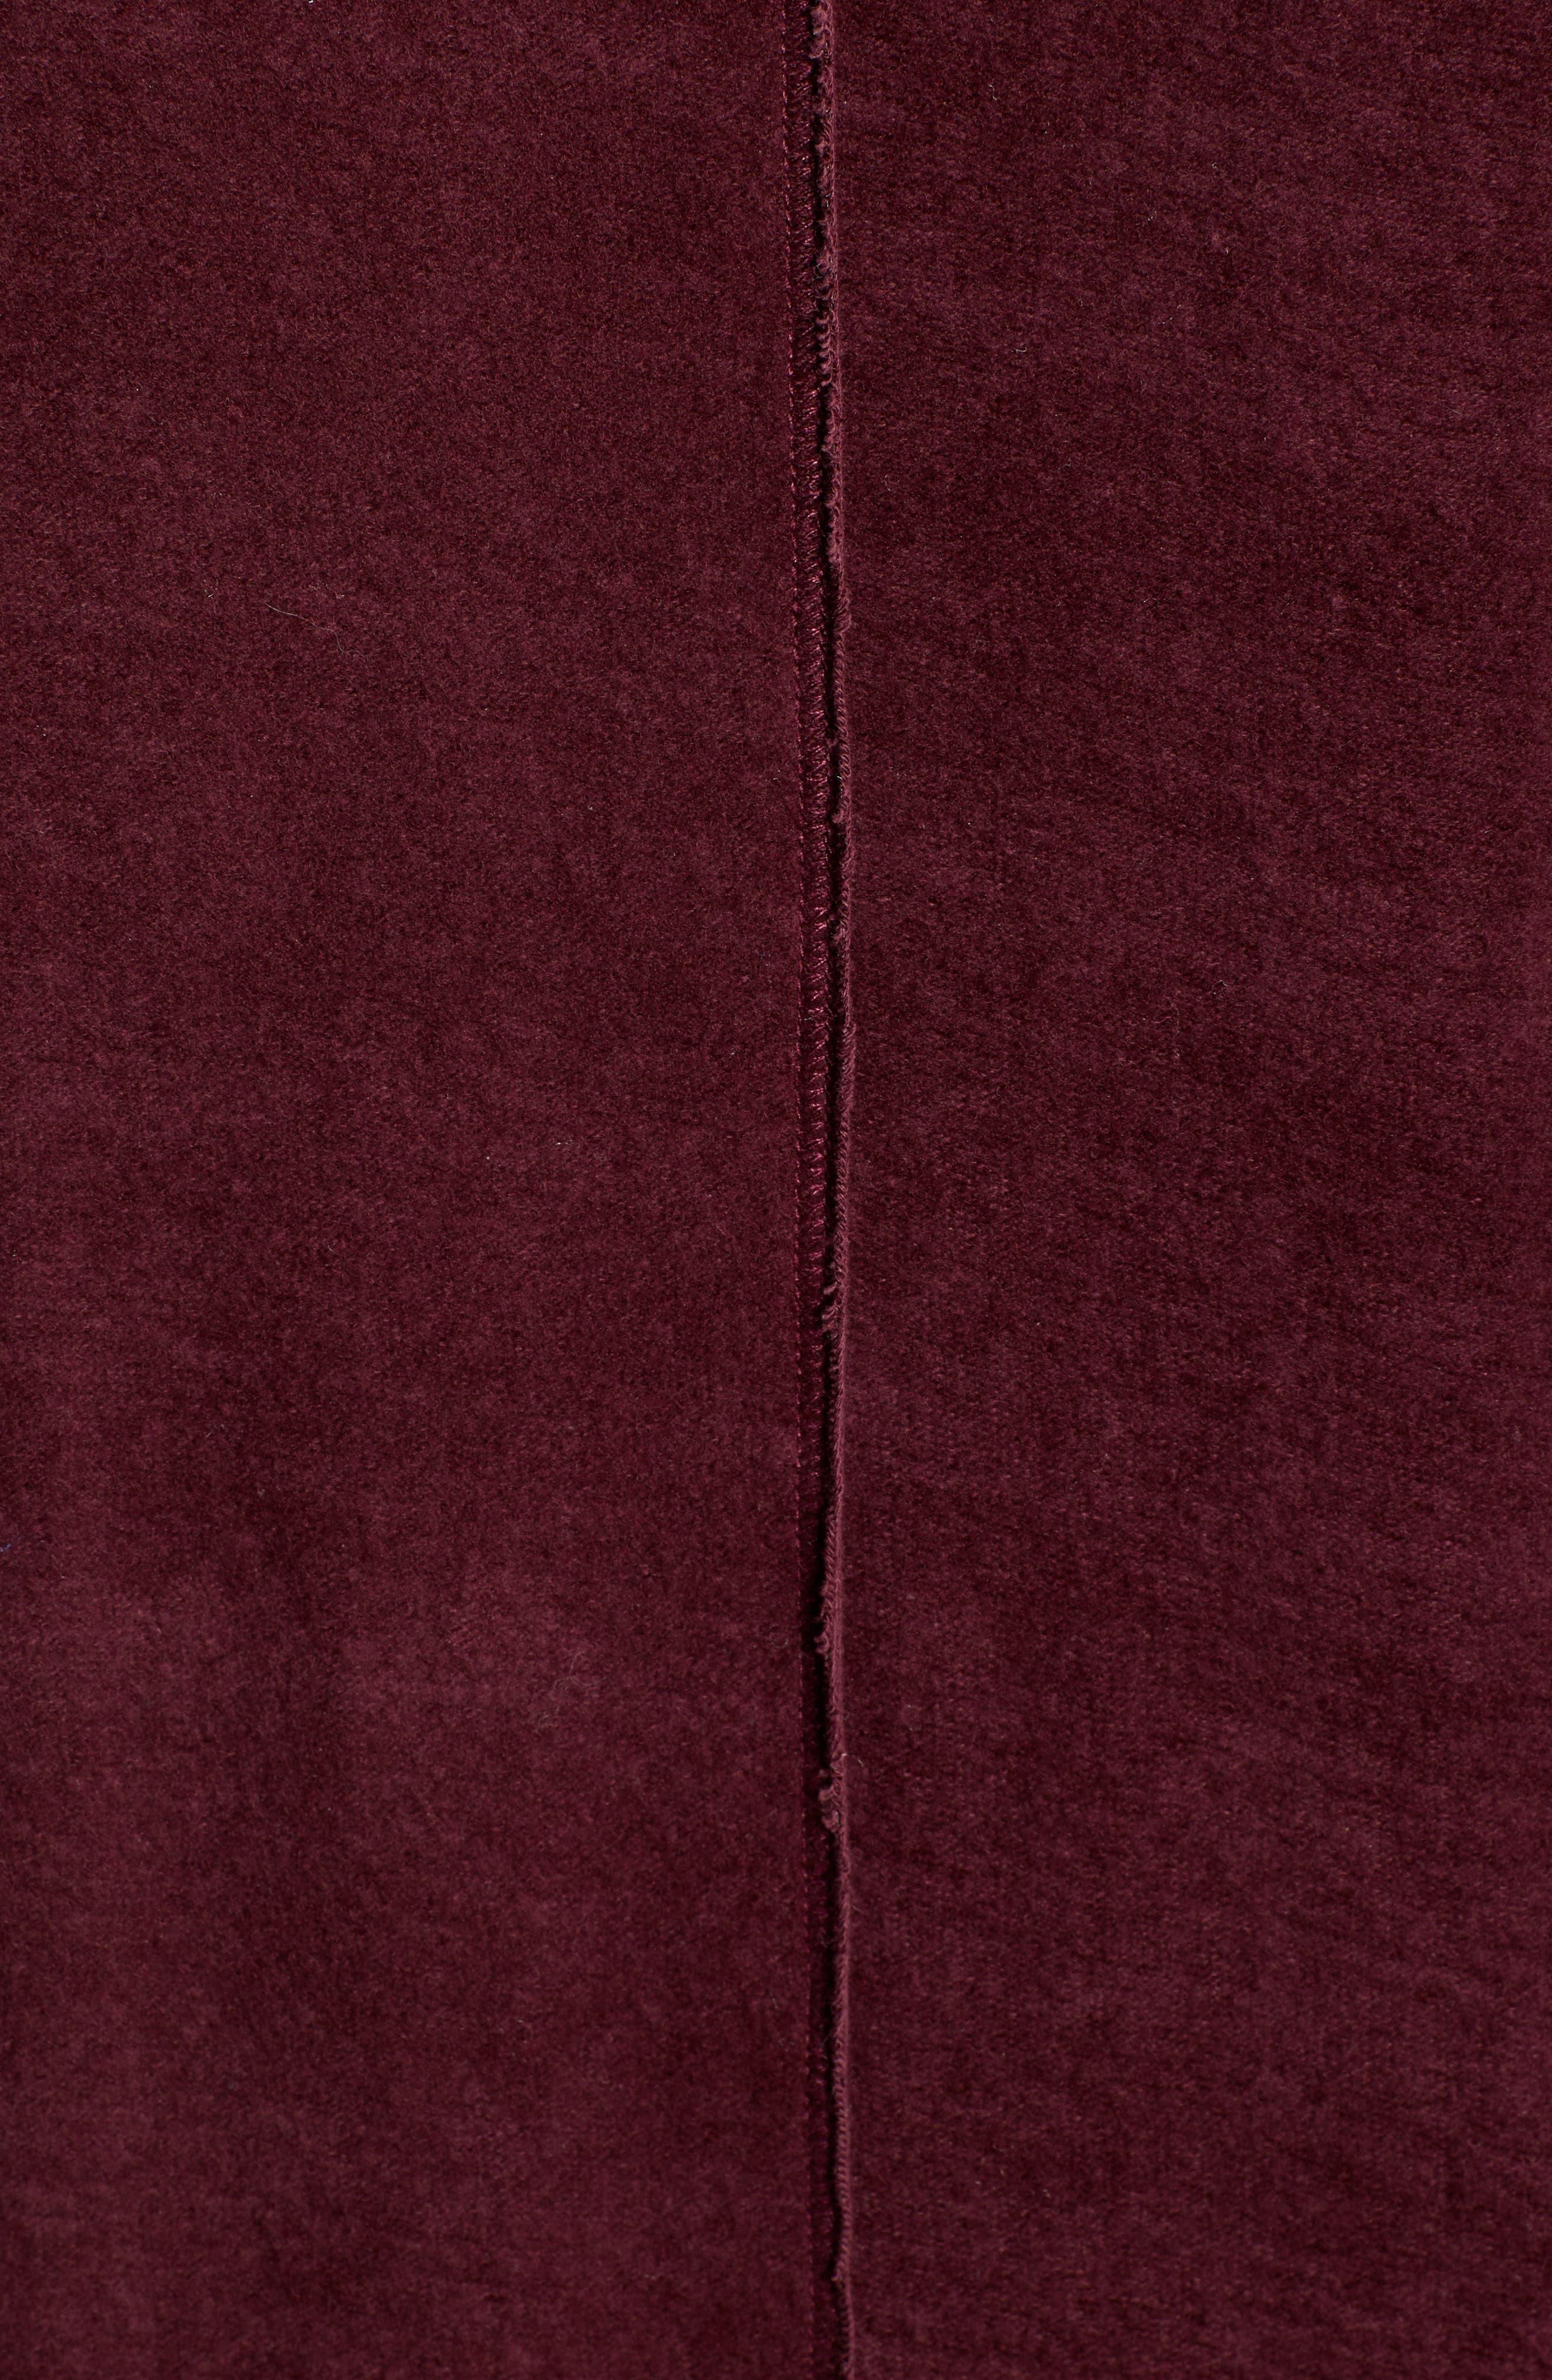 Knit Cowl Neck Tunic,                             Alternate thumbnail 5, color,                             930